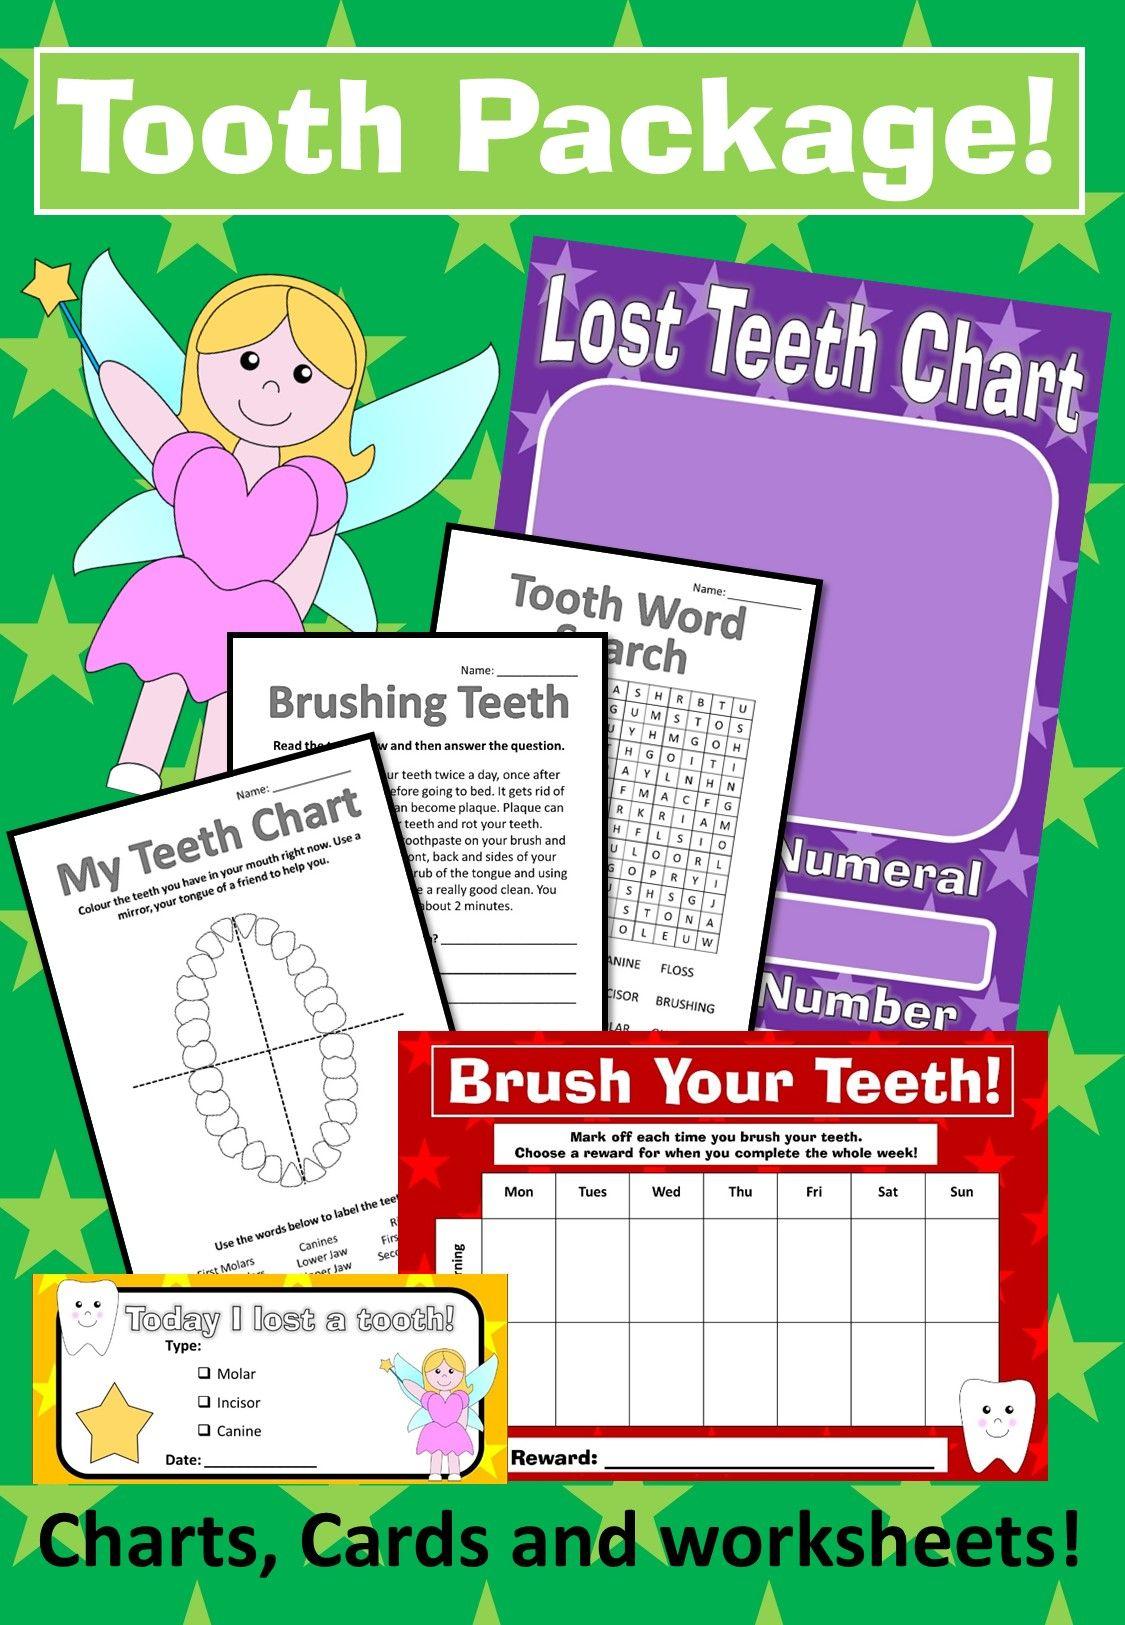 Tooth Package Lost Teeth Chart Brushing Teeth Chart